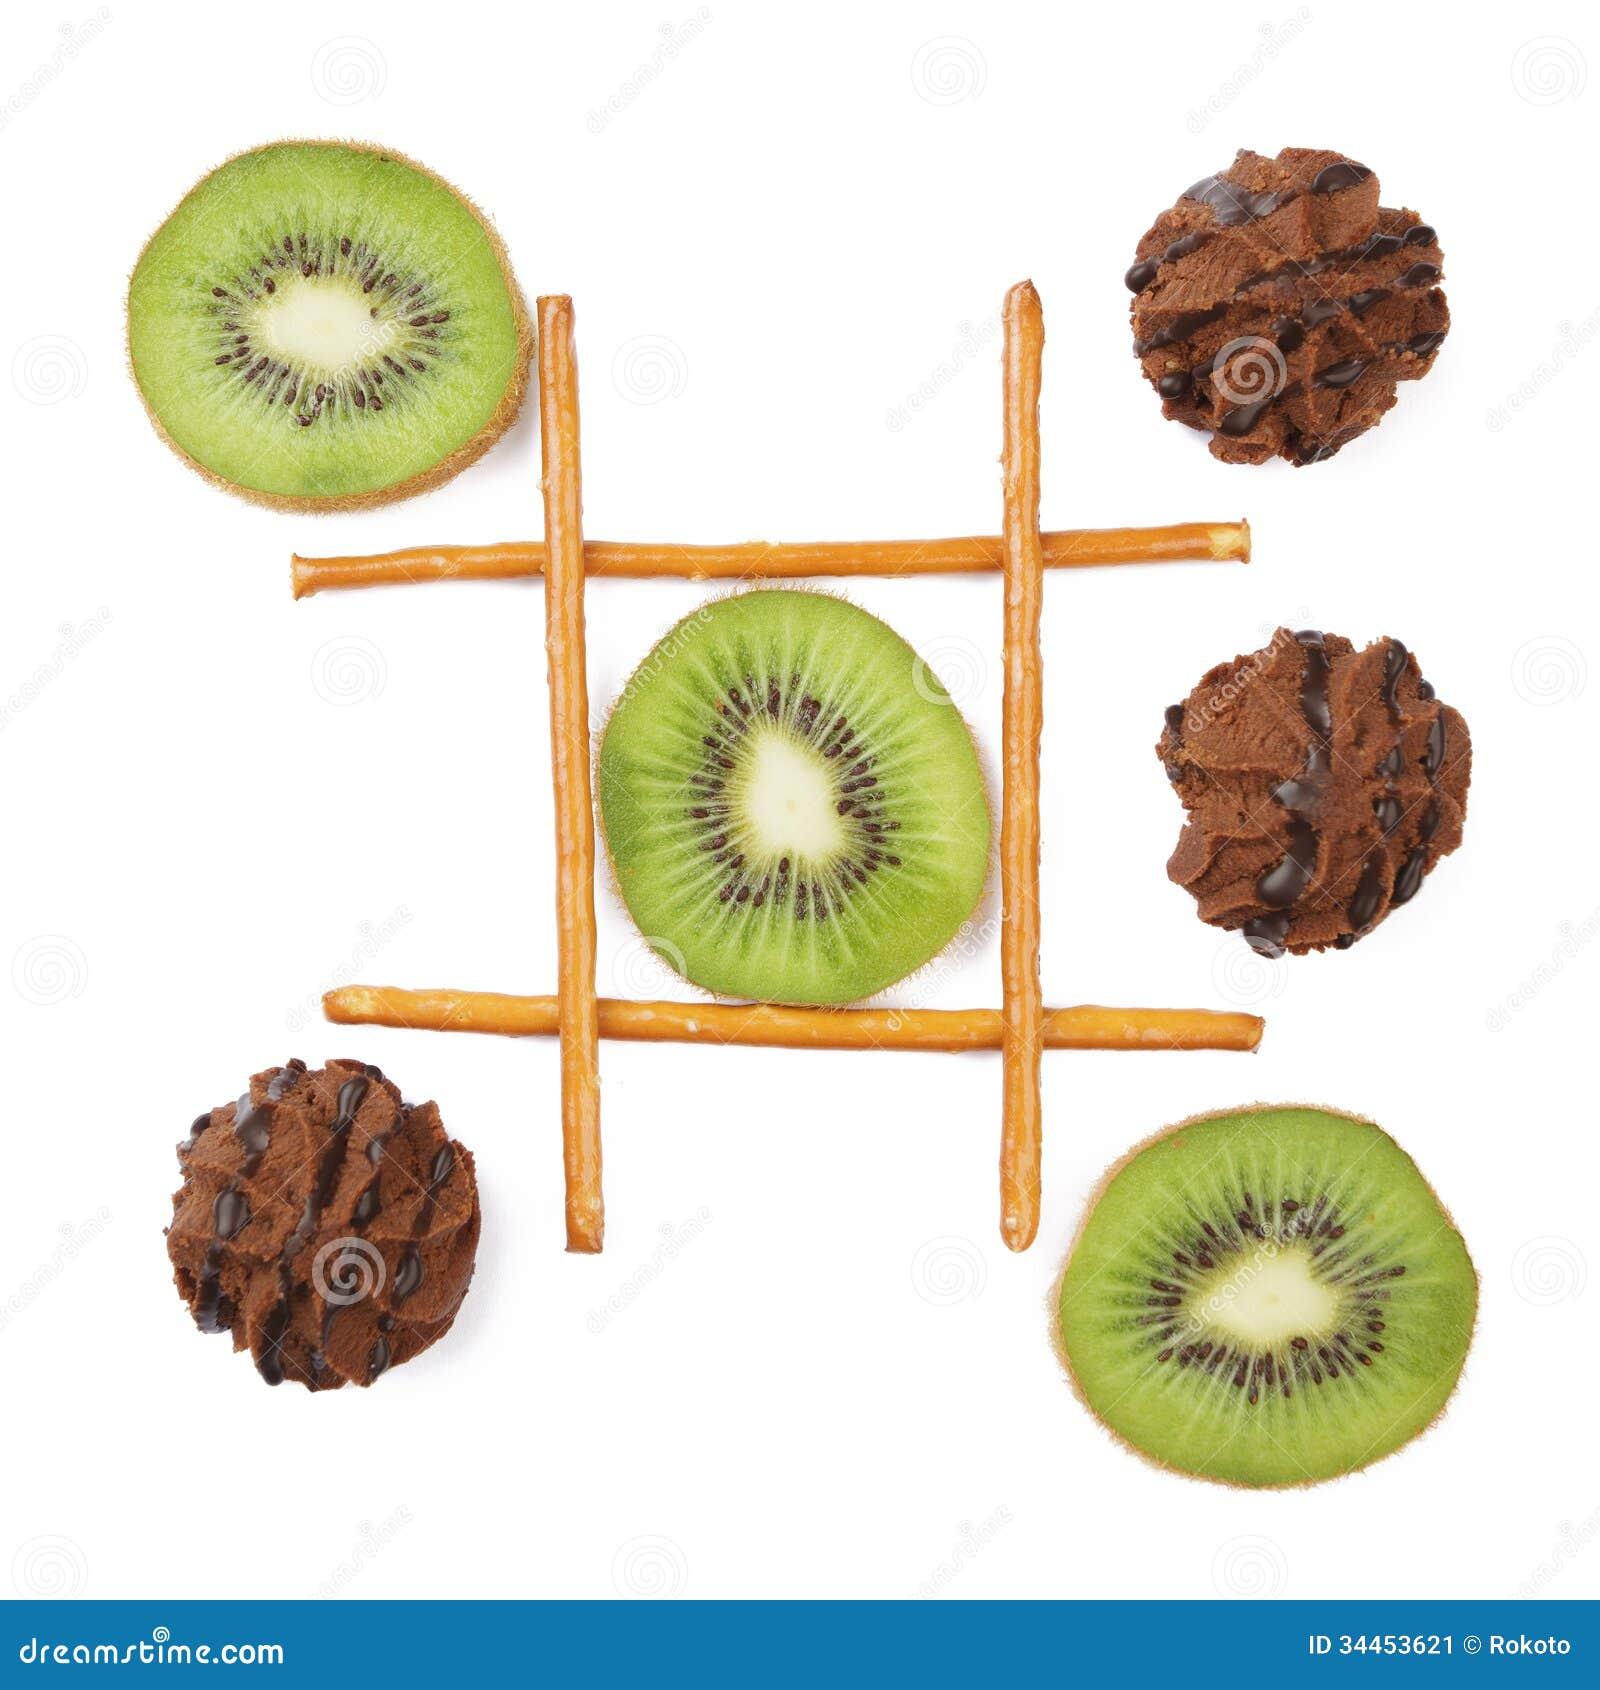 Healthy Vs Unhealthy Food Stock Image - Image: 34453621